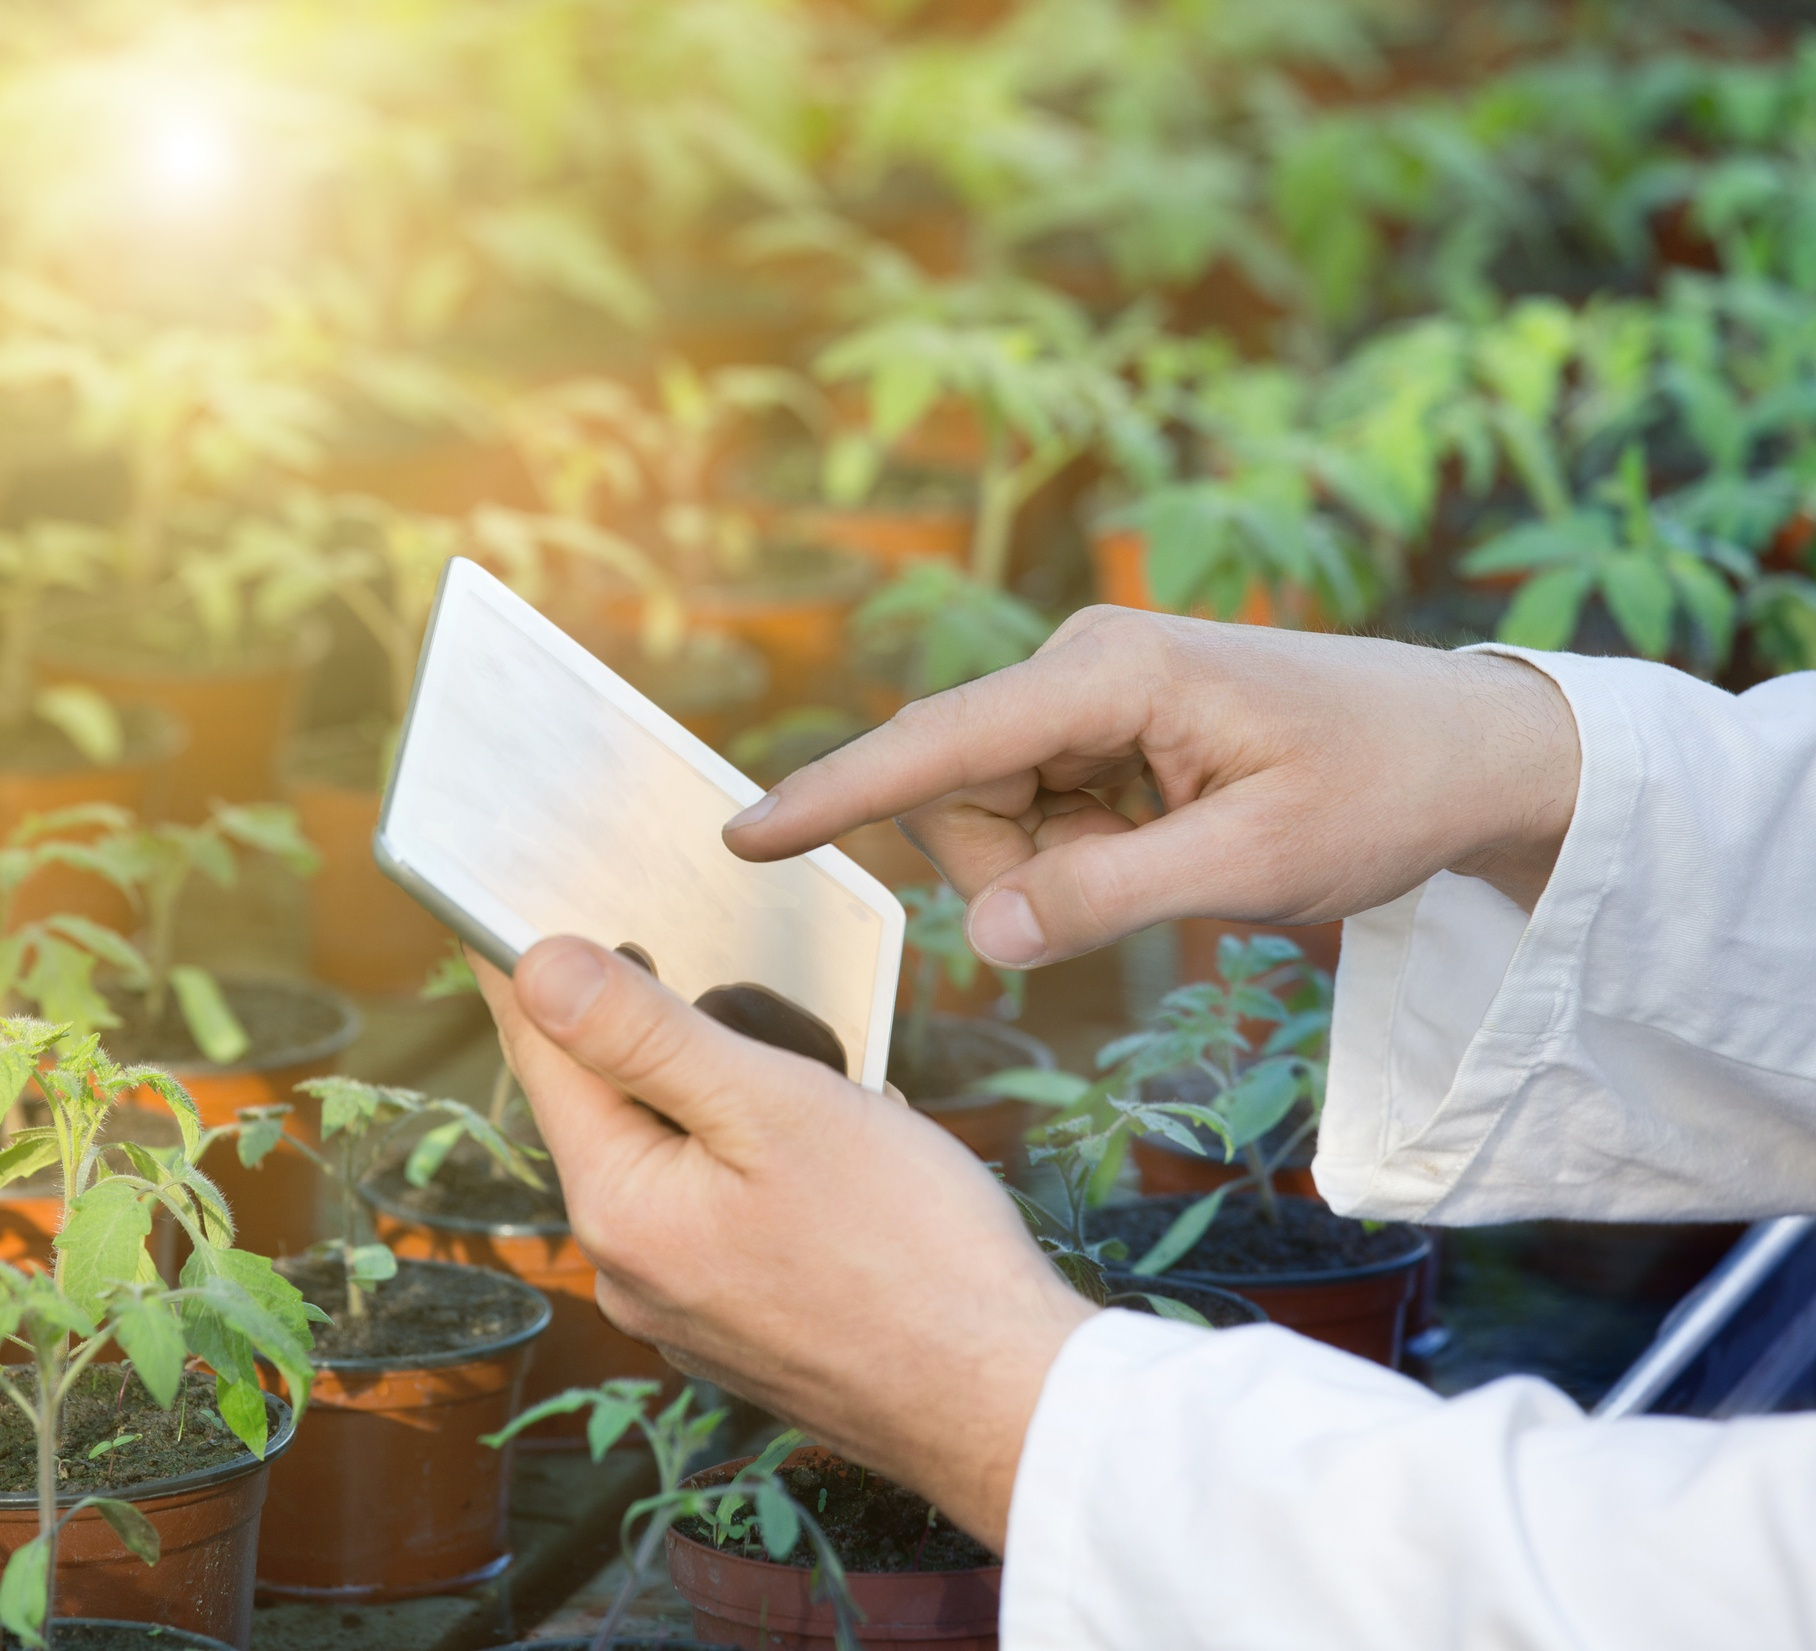 Ag-tech Retailers | Growlink